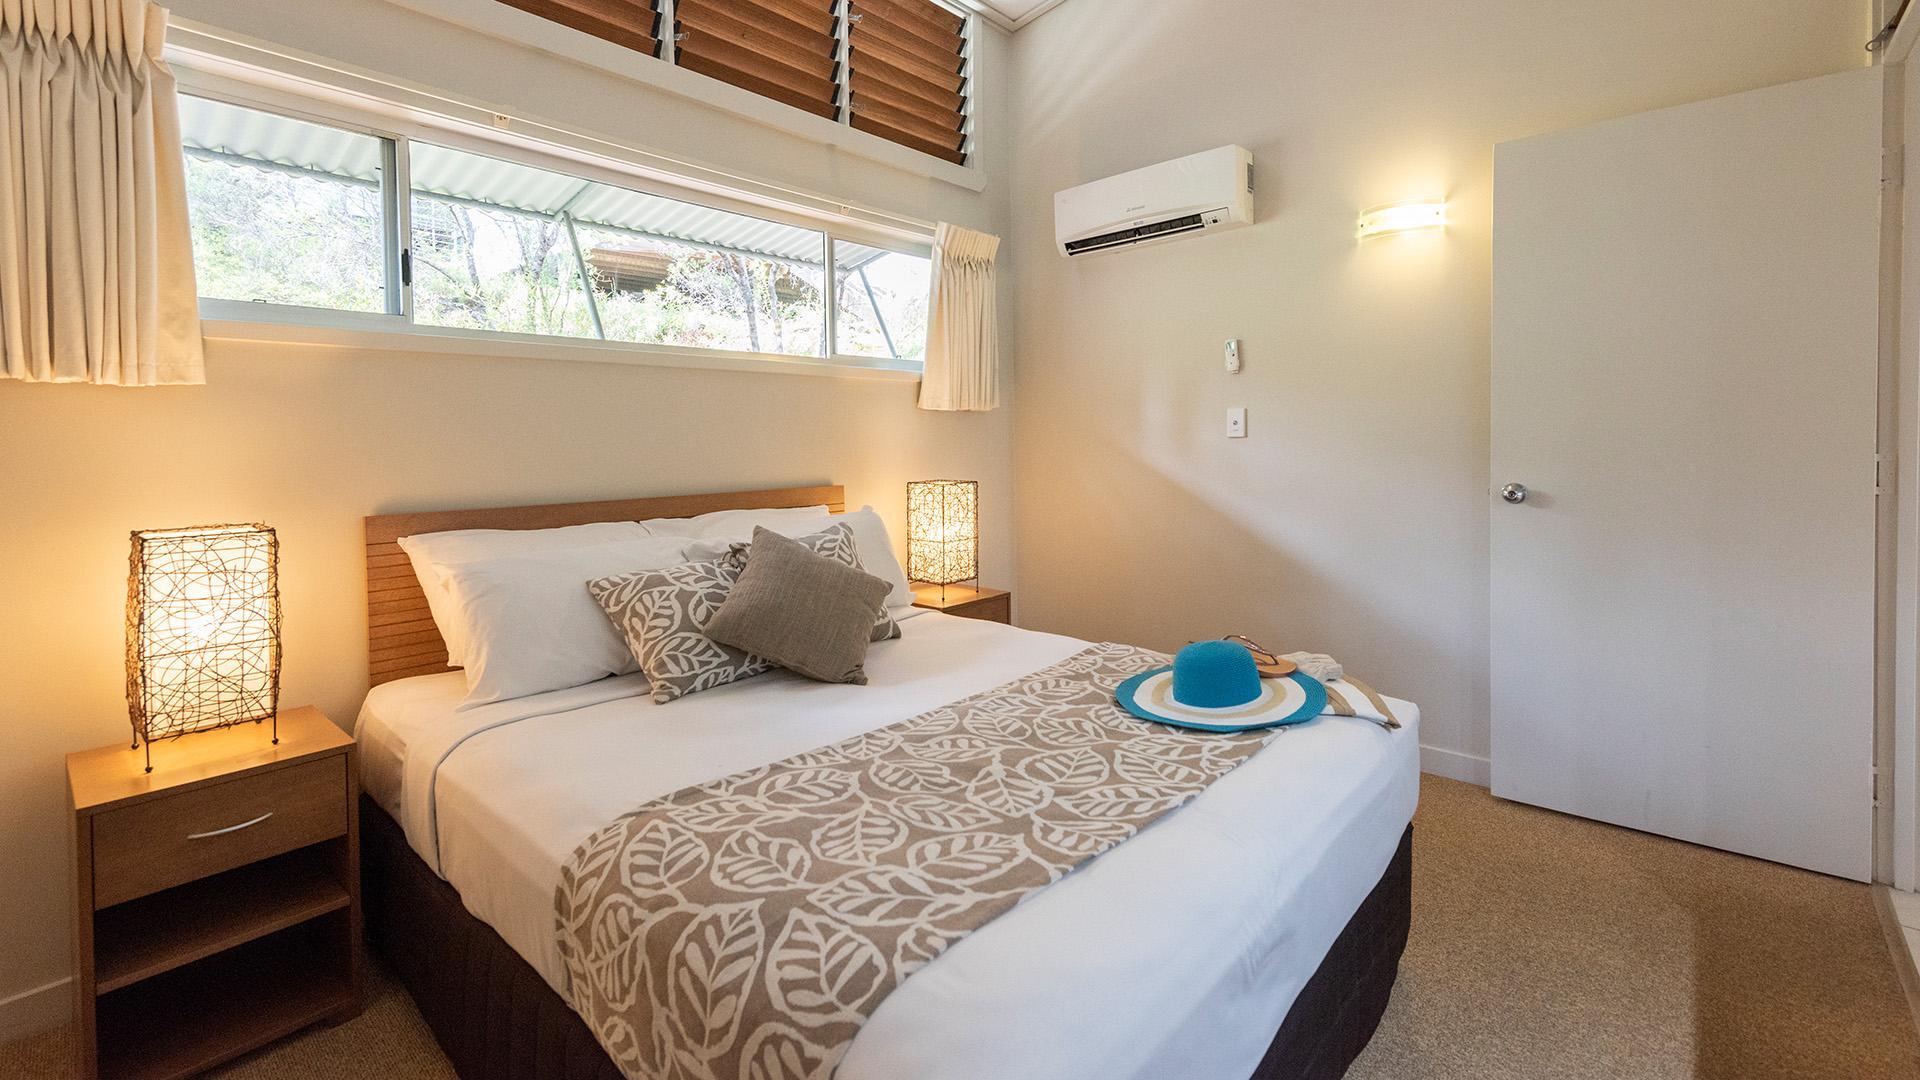 Two-Bedroom Villa image 1 at Kingfisher Bay Resort by Fraser Coast Regional, Queensland, Australia